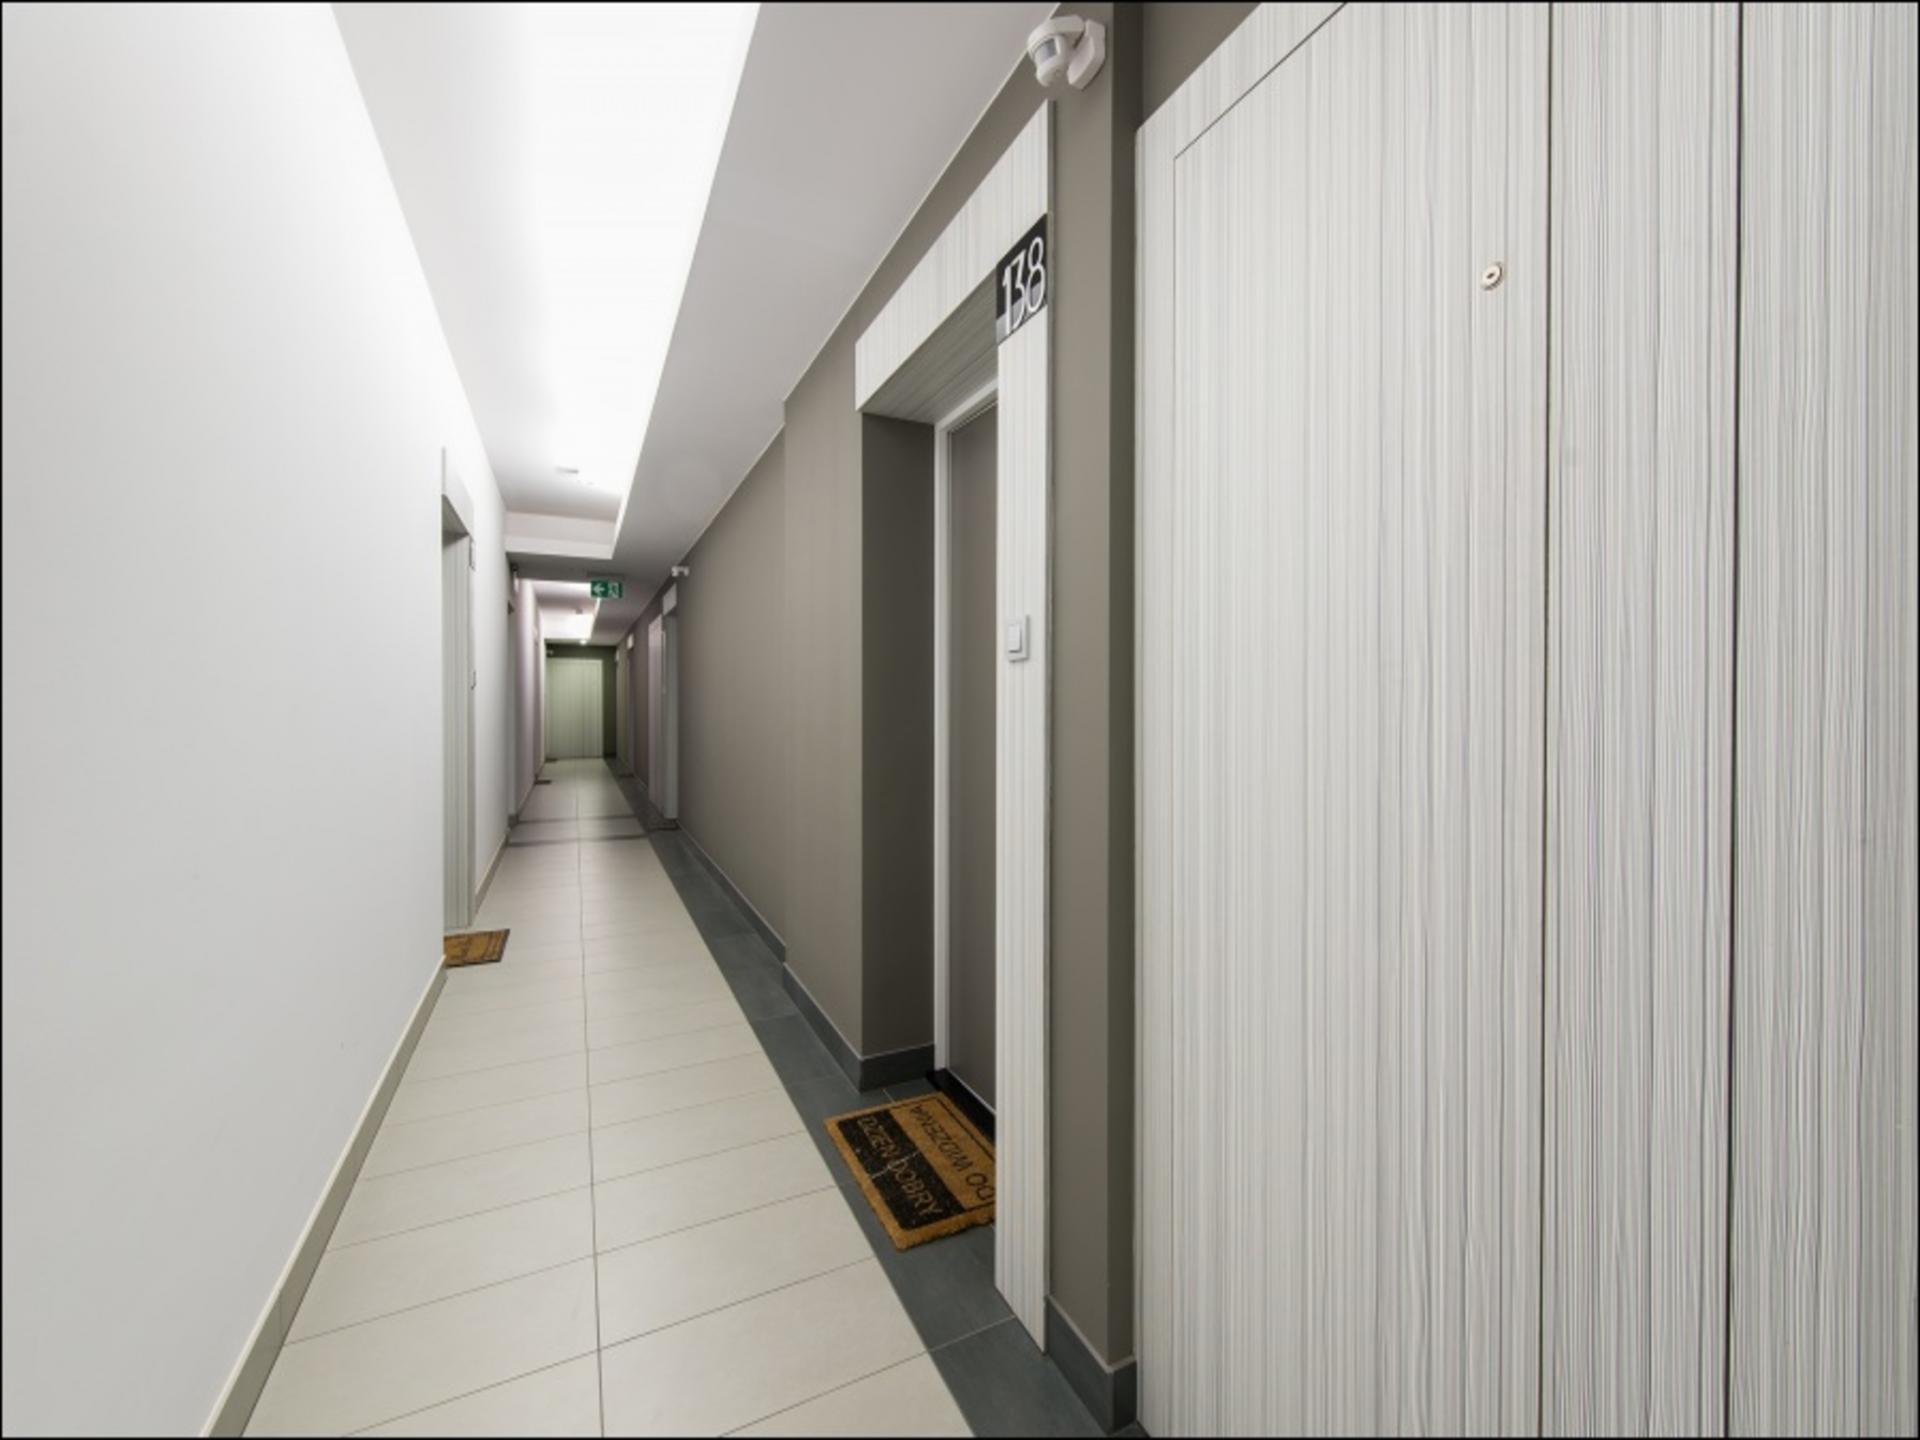 Hall at Klobucka Street Apartment, Wyczółki, Warsaw